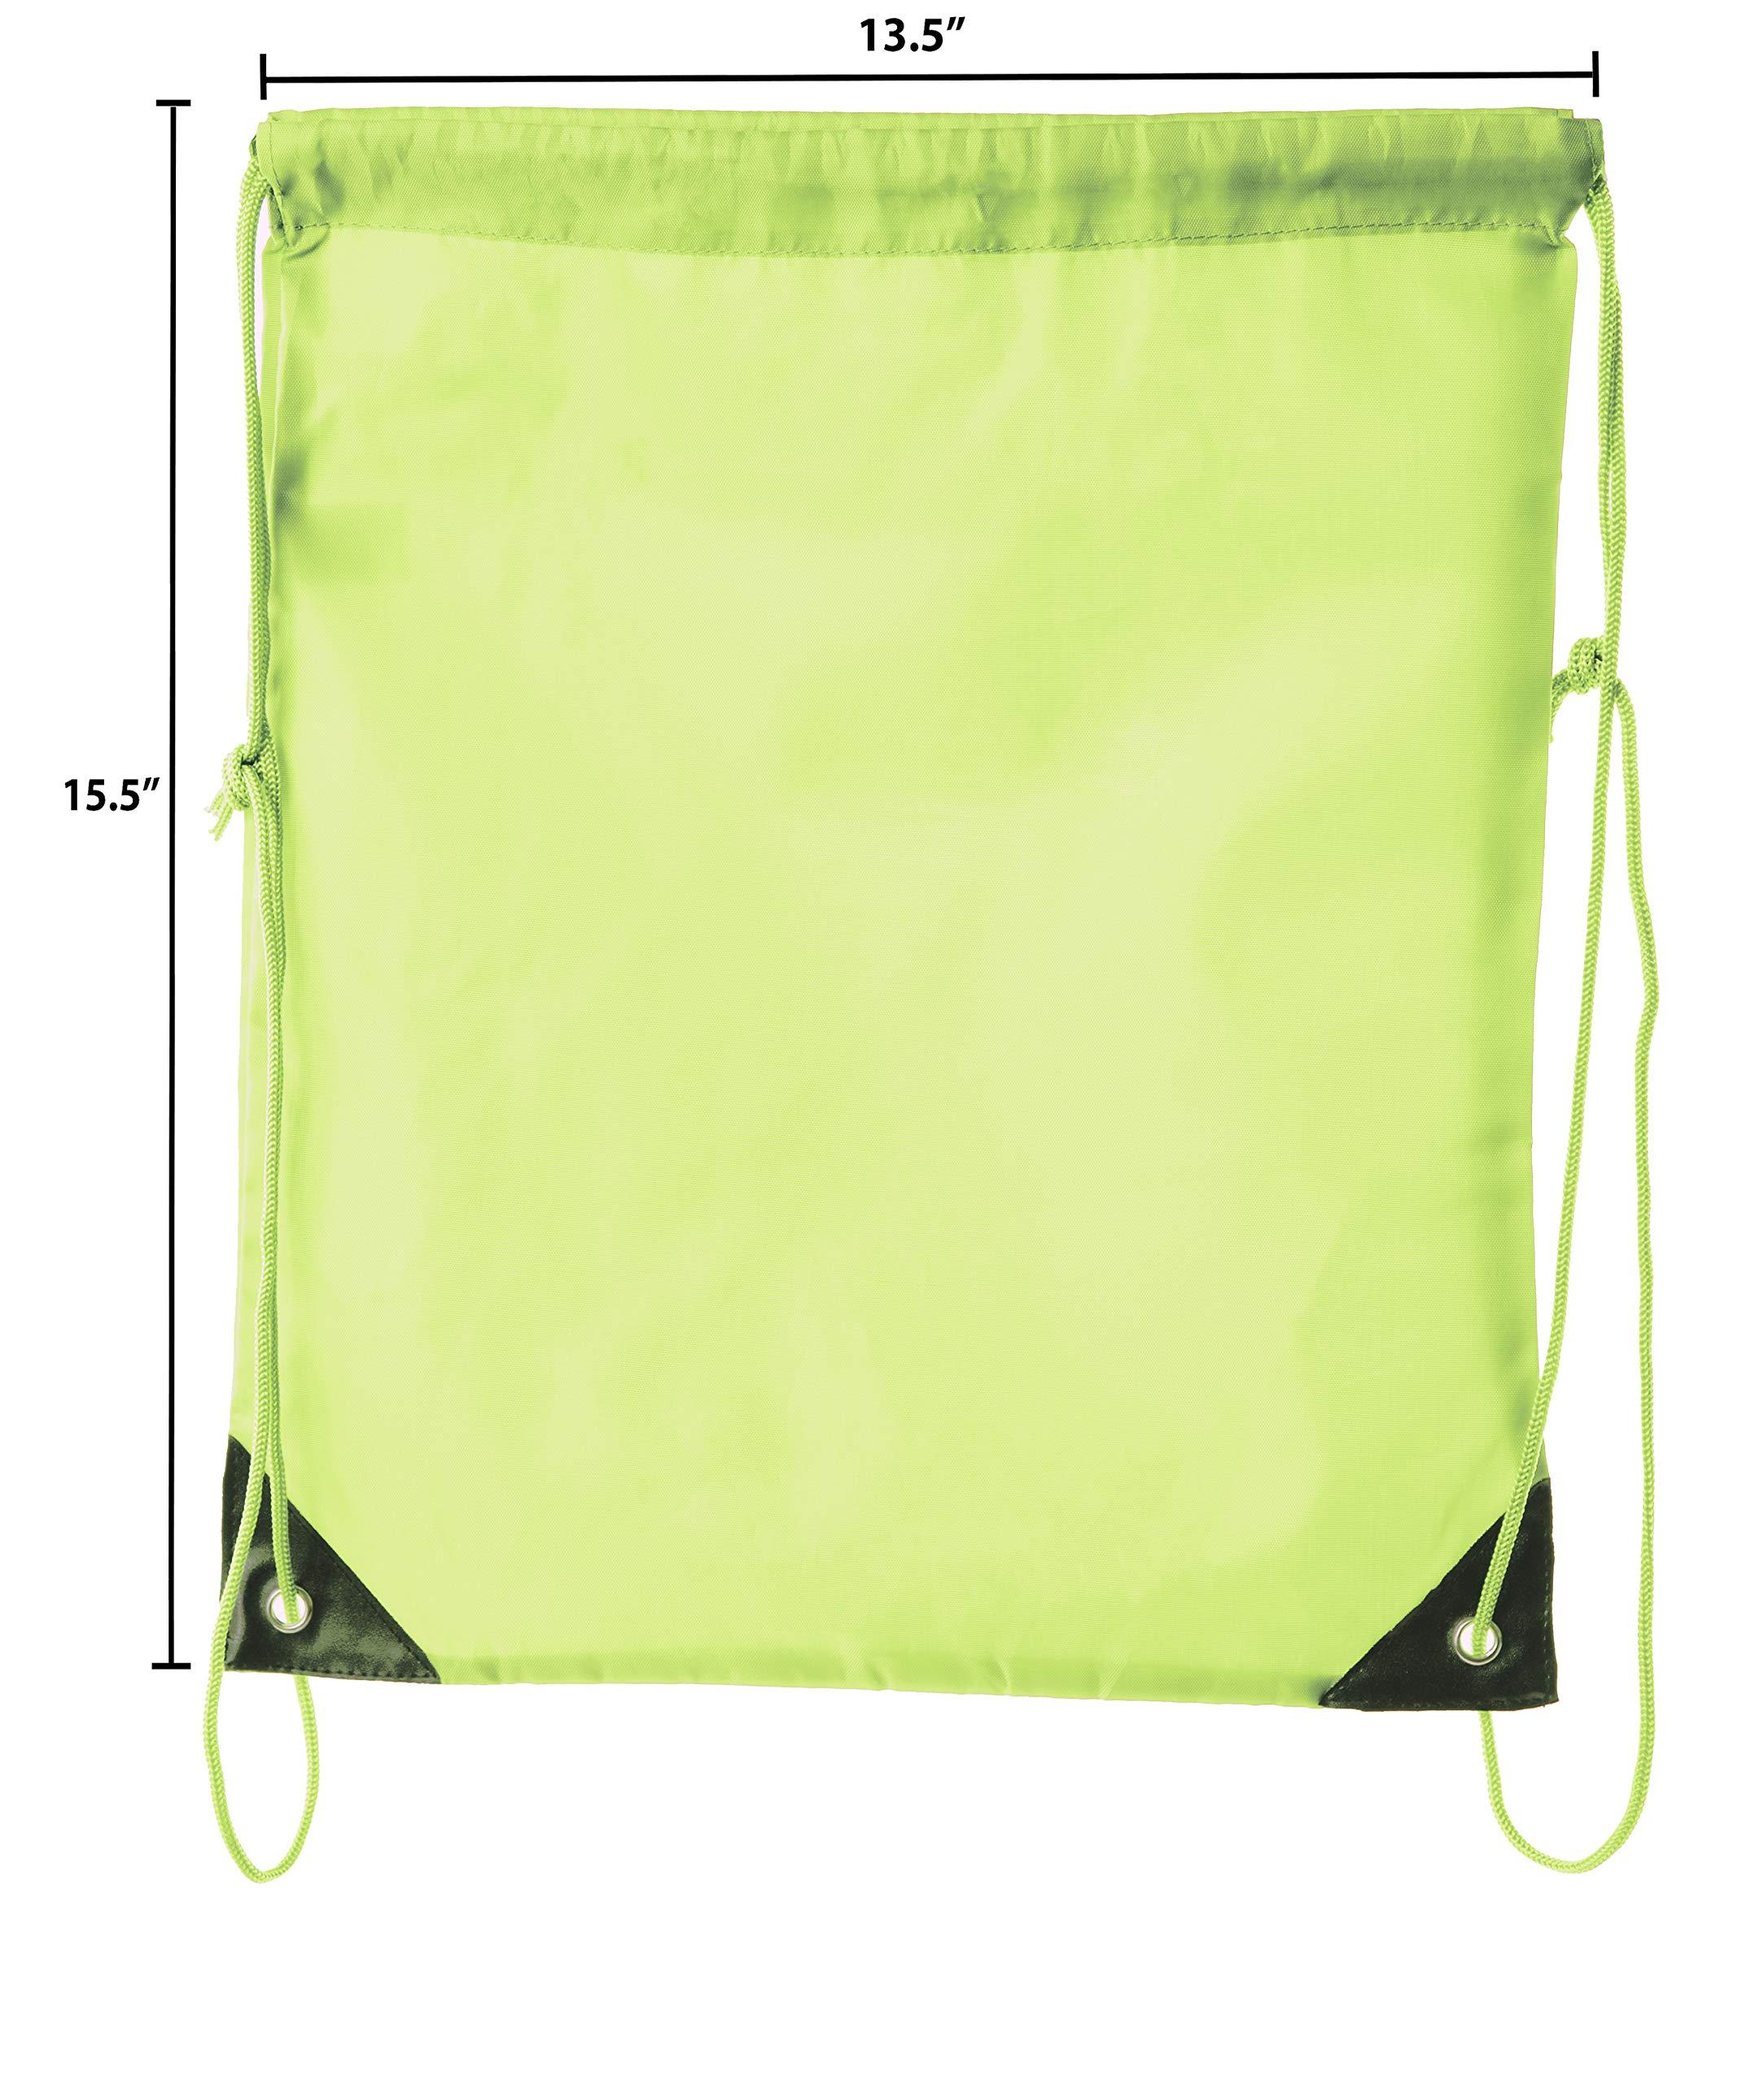 Mato & Hash Drawstring Bulk Bags Cinch Sacks Backpack Pull String Bags   15 Colors   1PK-100PK Available by Mato & Hash (Image #2)